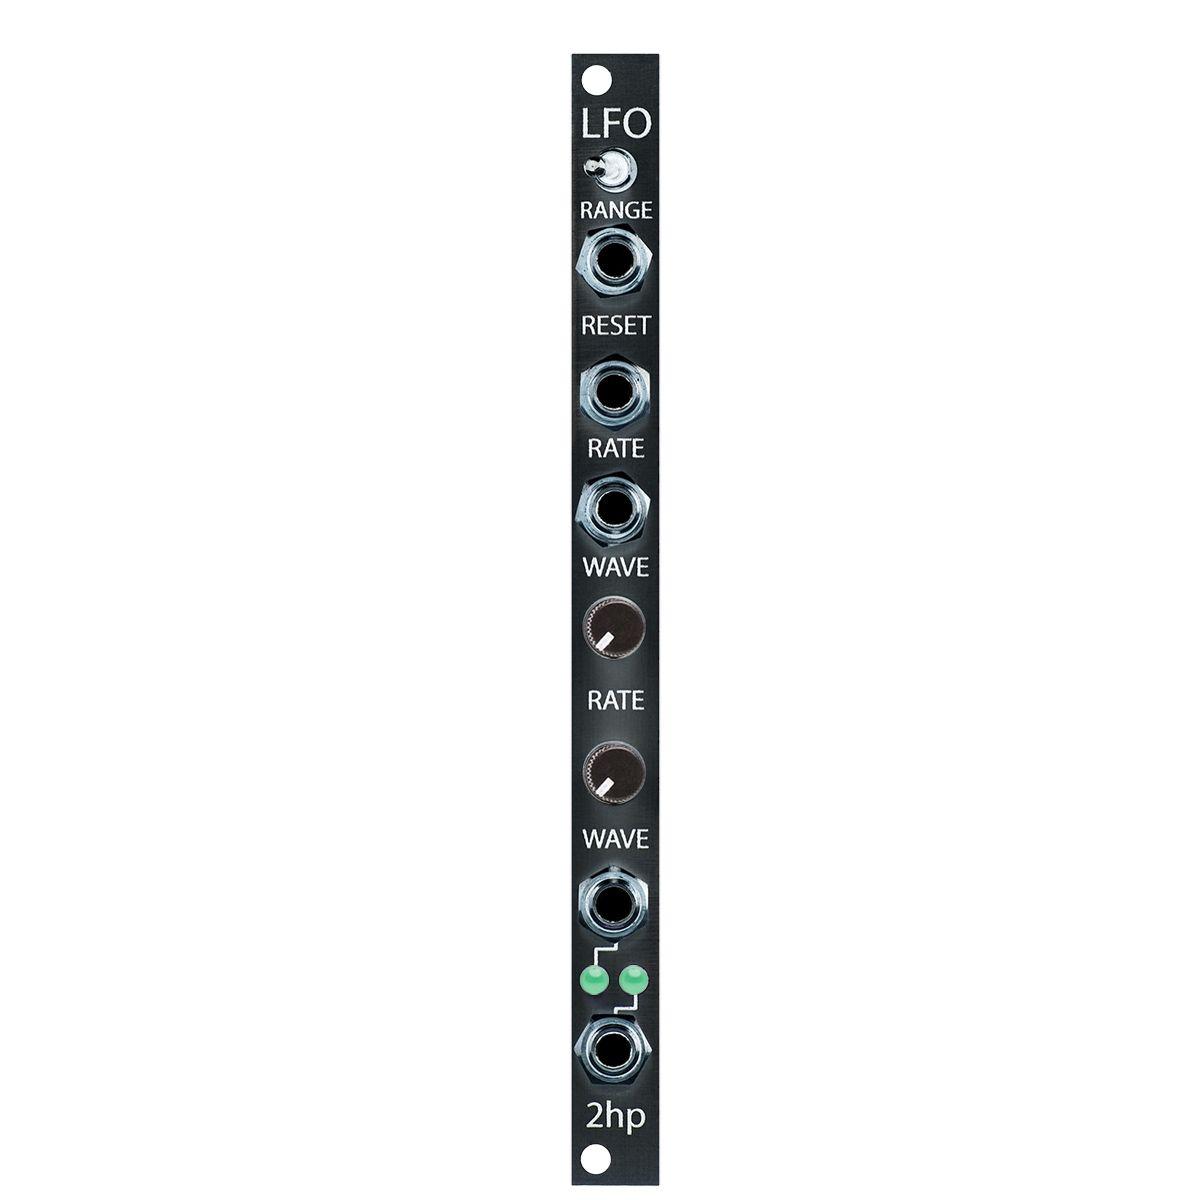 2hp LFO V2 Eurorack Module (Black)